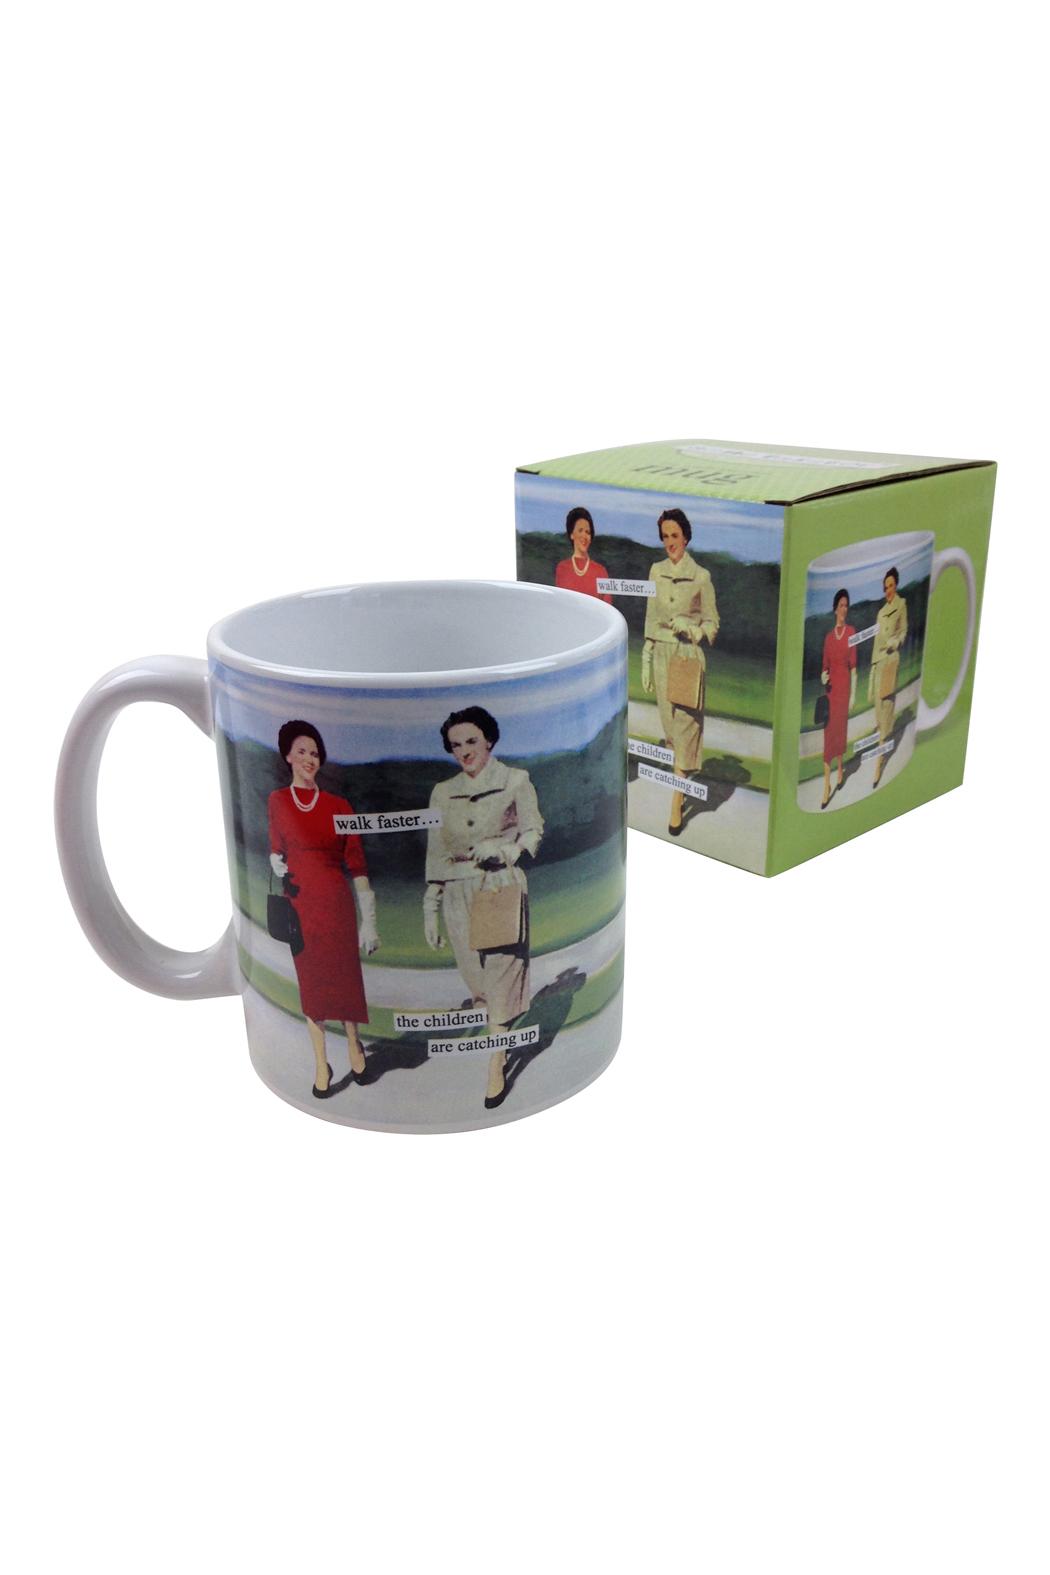 Walk faster mug go home modern decor gifts for Modern home decor gifts